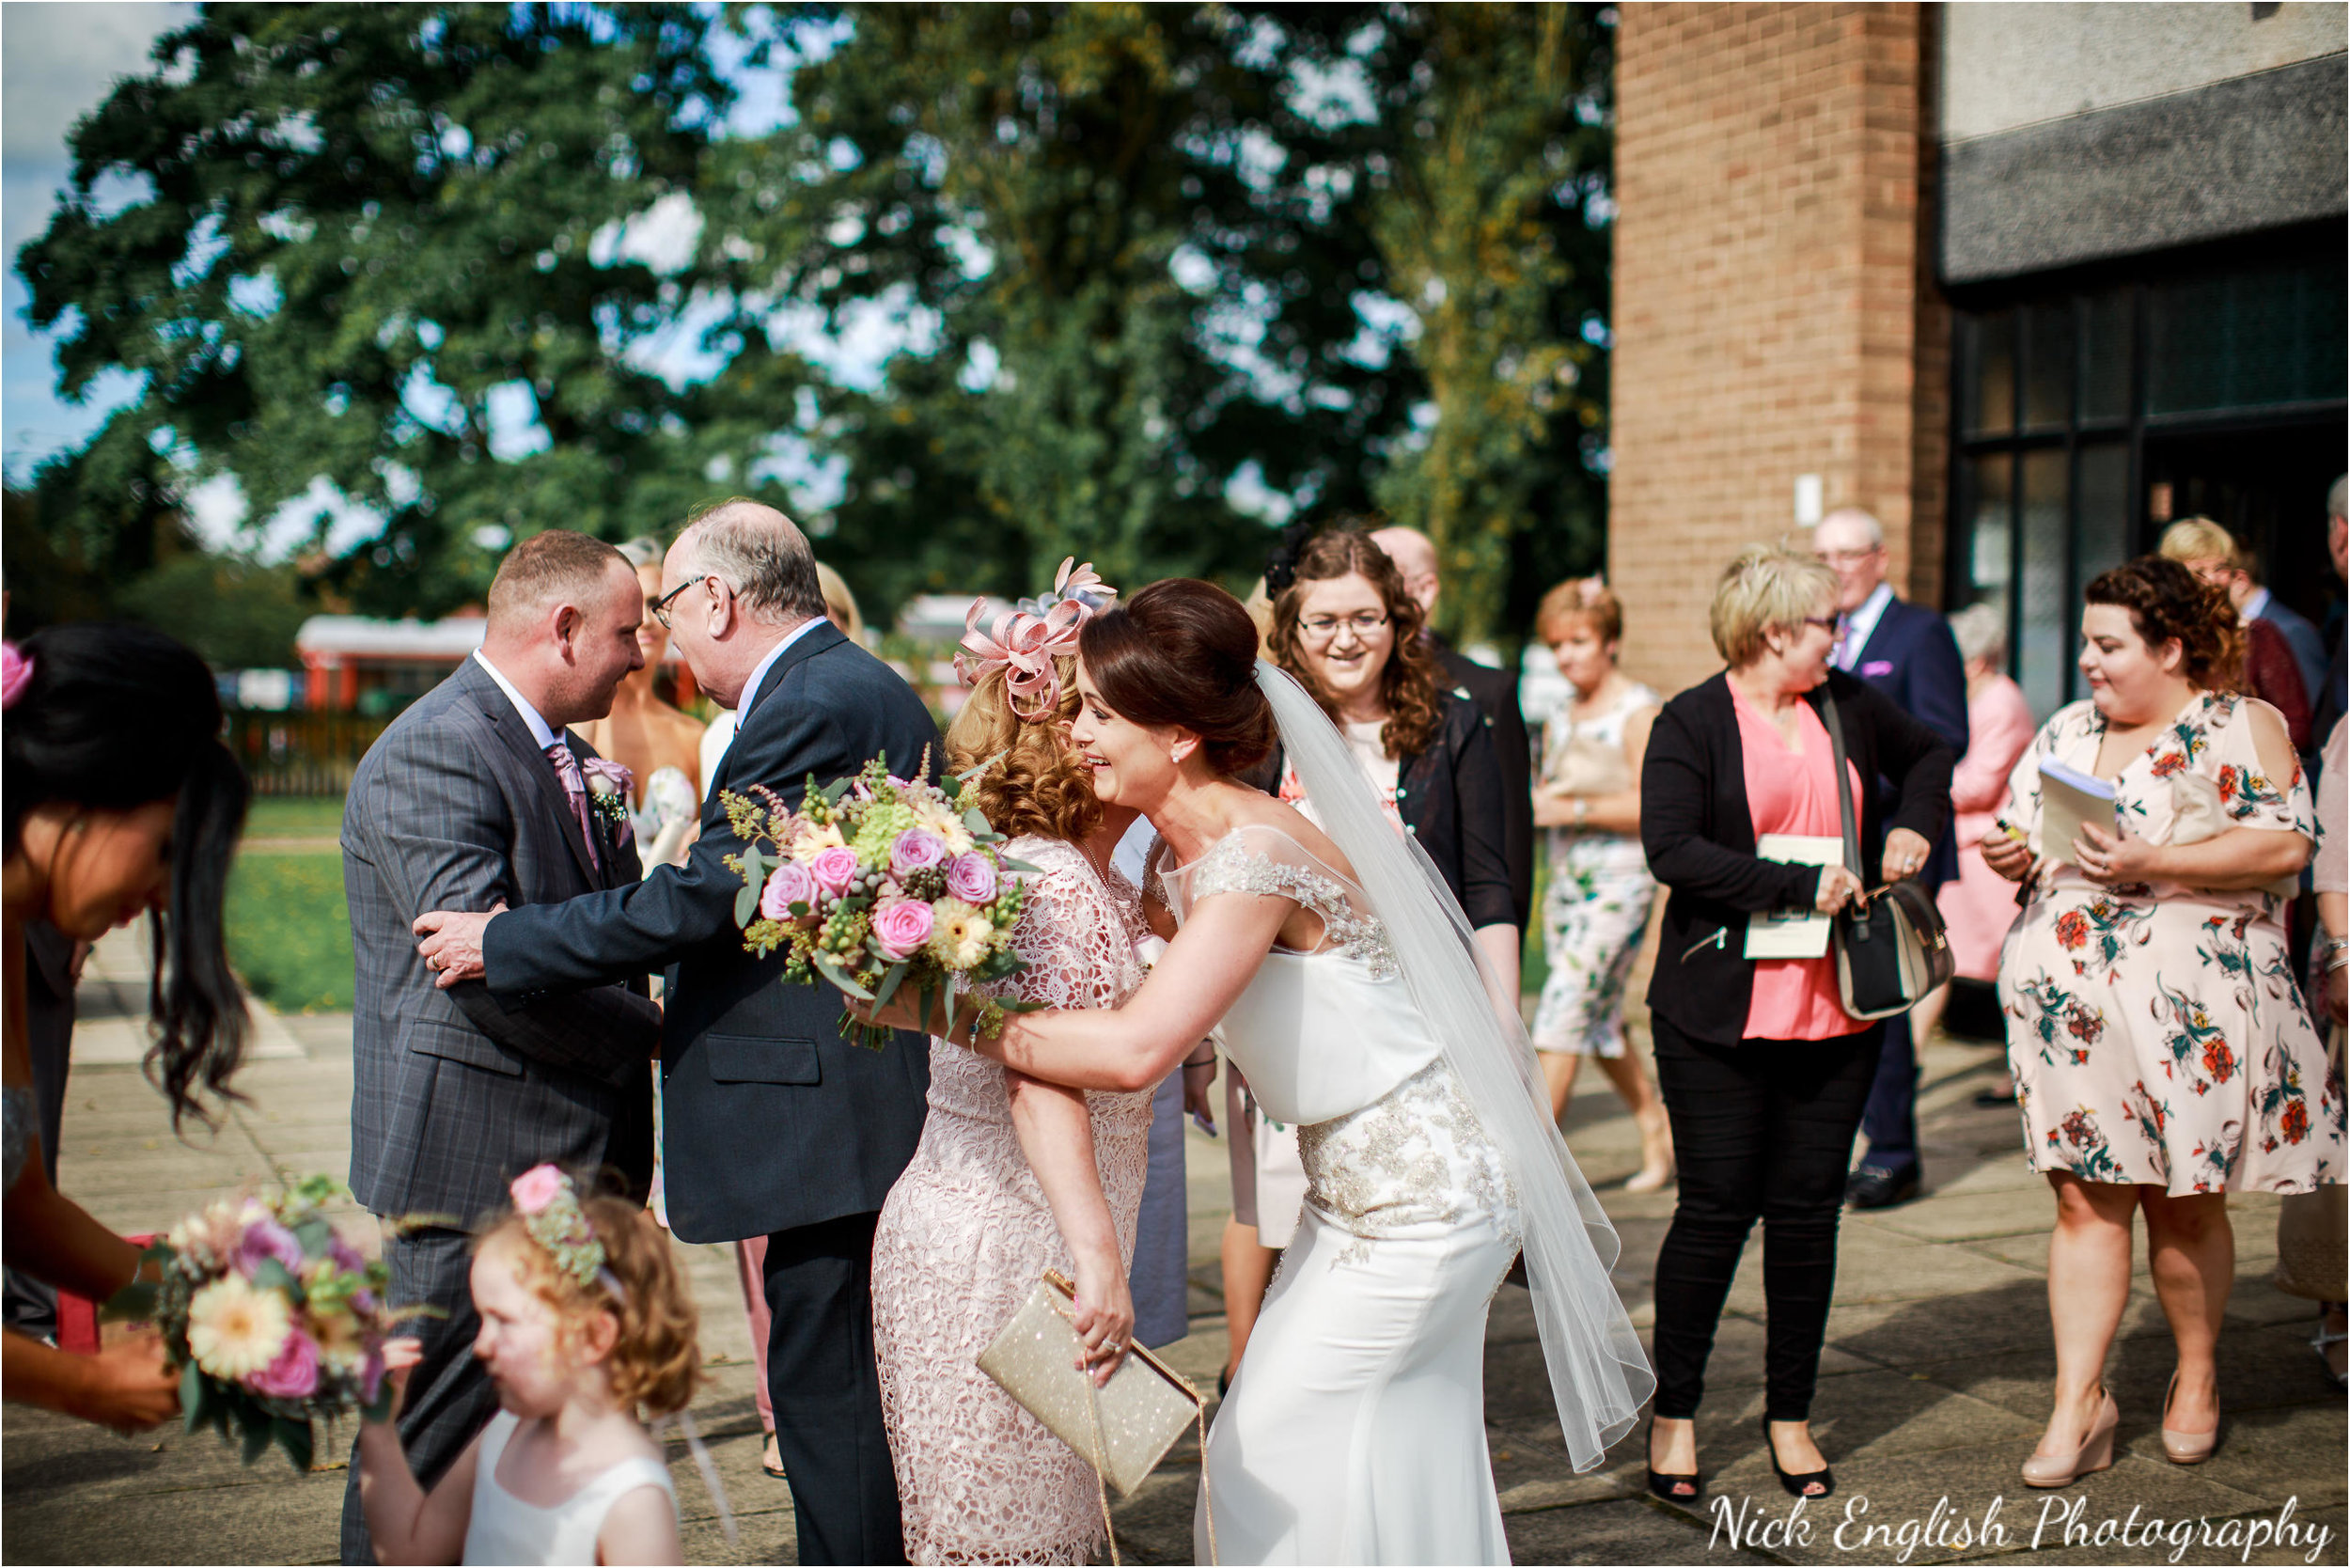 Stacey-Ash-Wedding-Photographs-Stanley-House-Preston-Lancashire-88.jpg